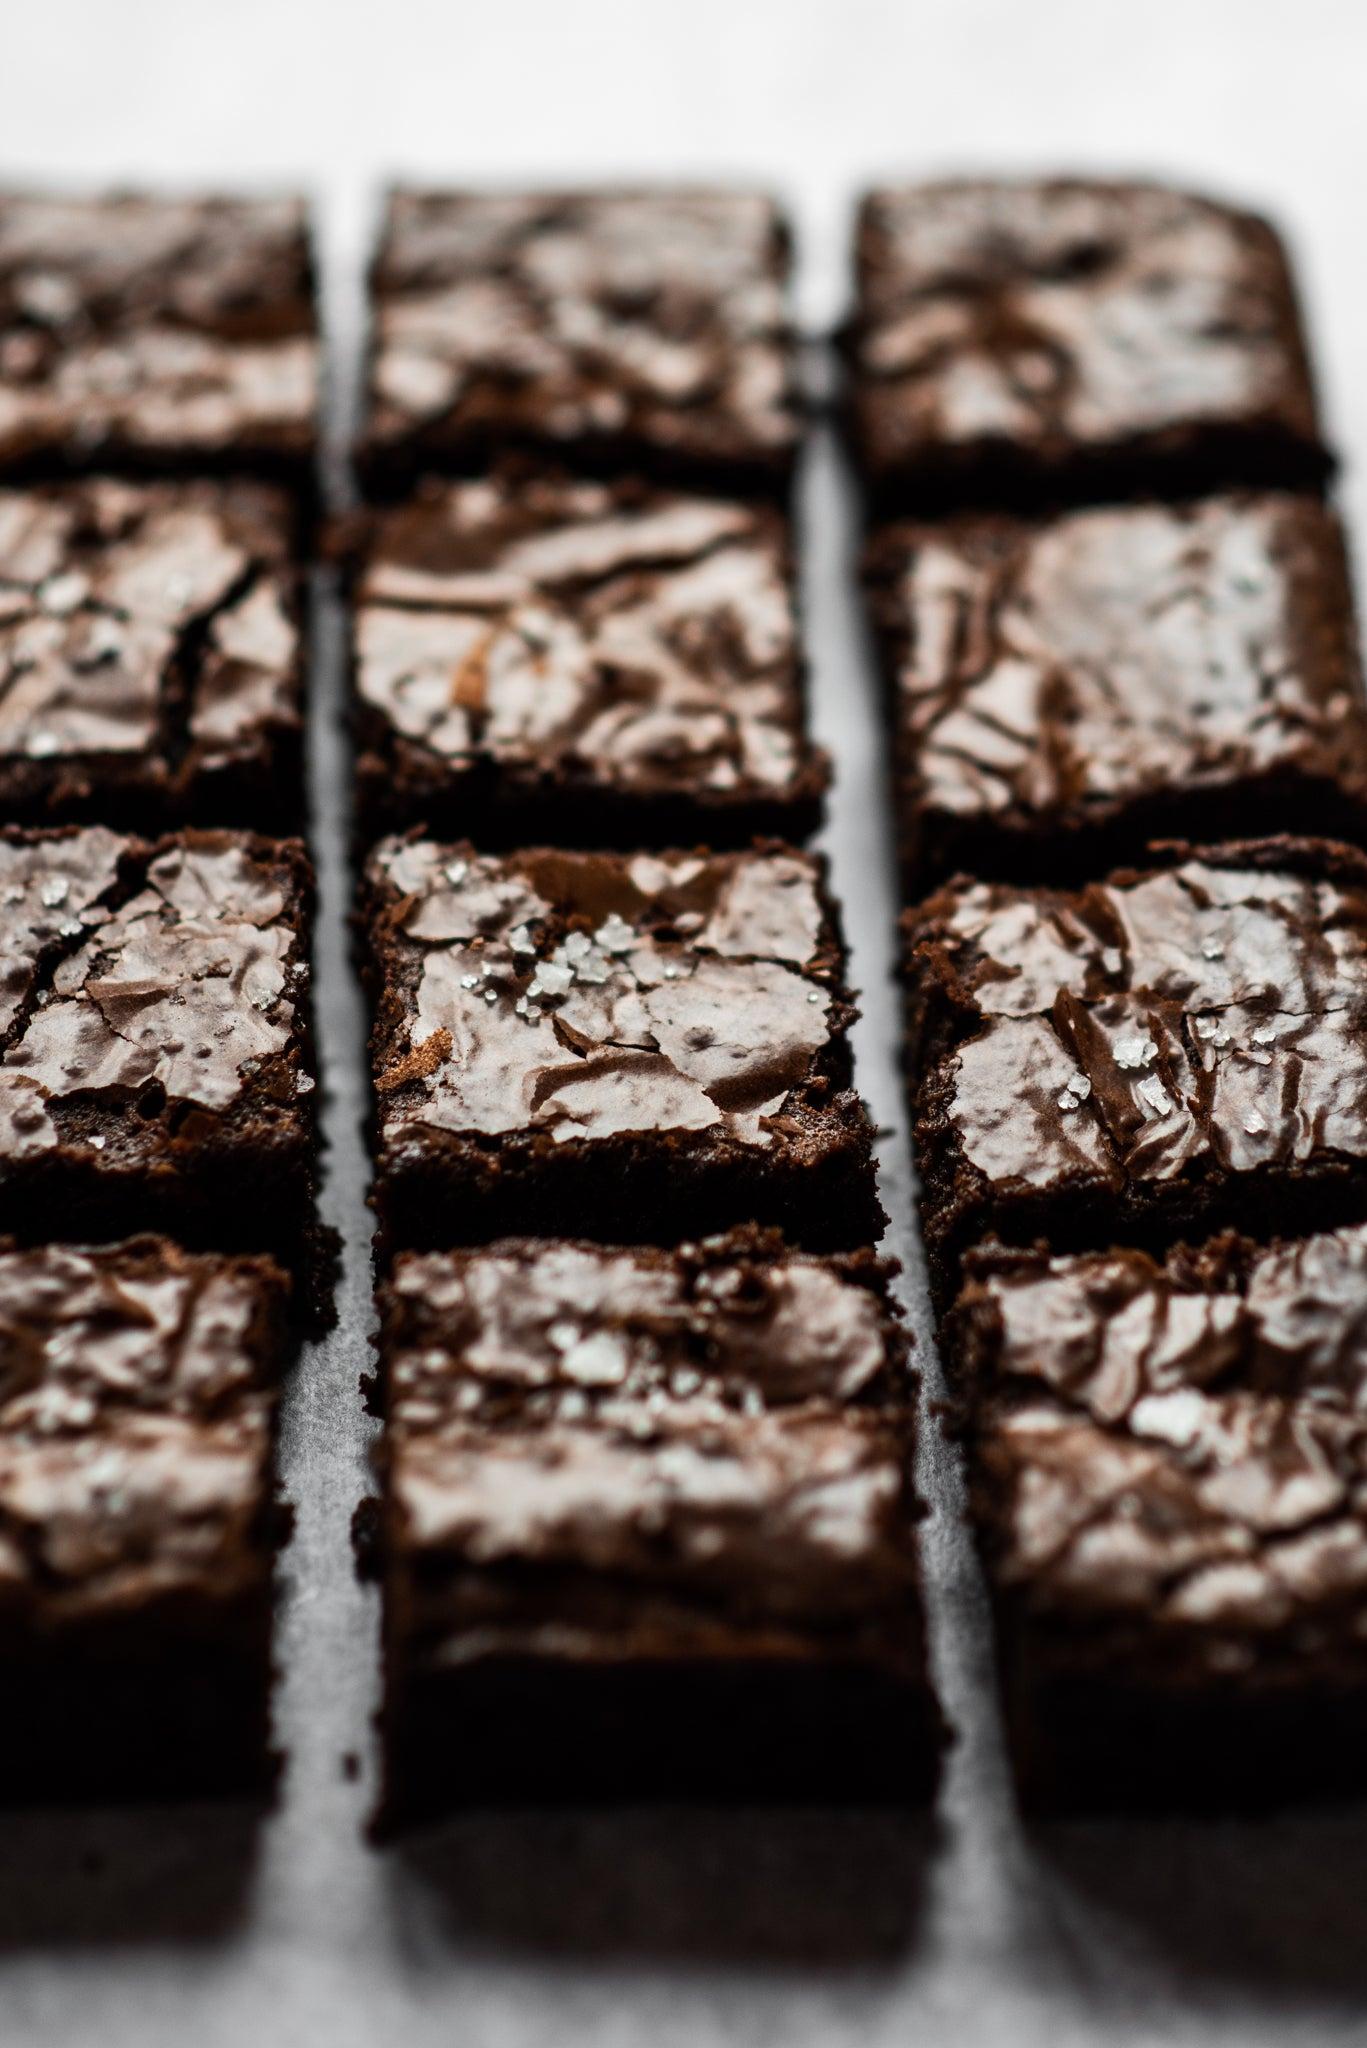 Close up of a gooey chocolate brownies sprinkled in sugar